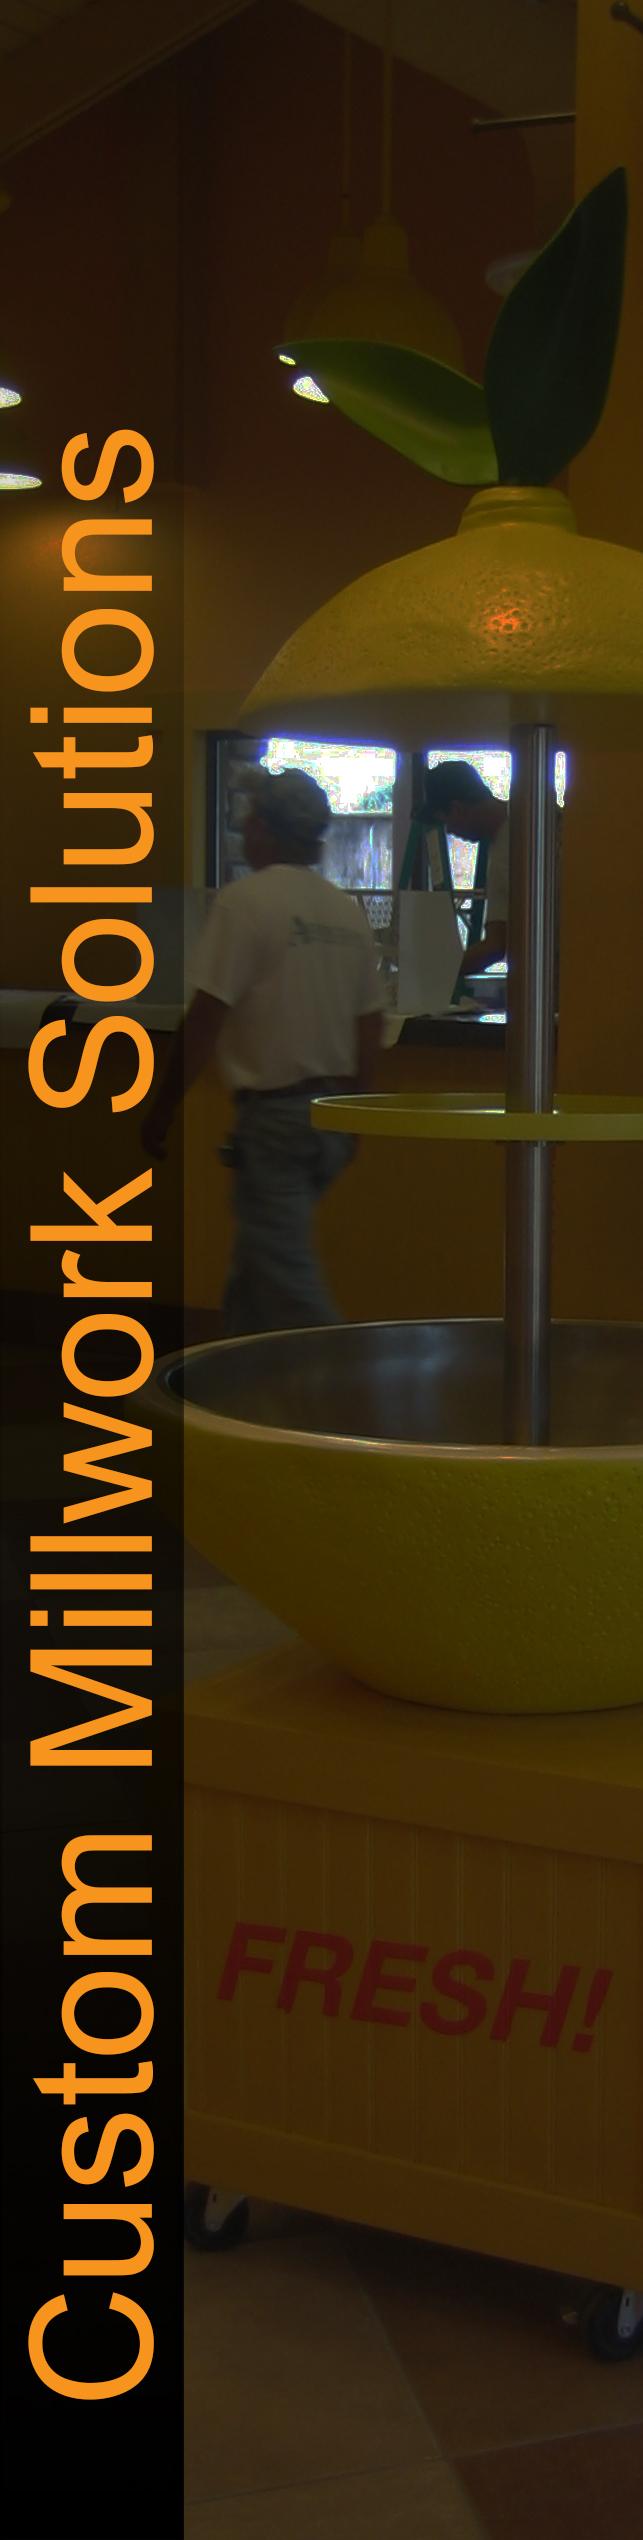 Millwork Solutions BANNER.jpg